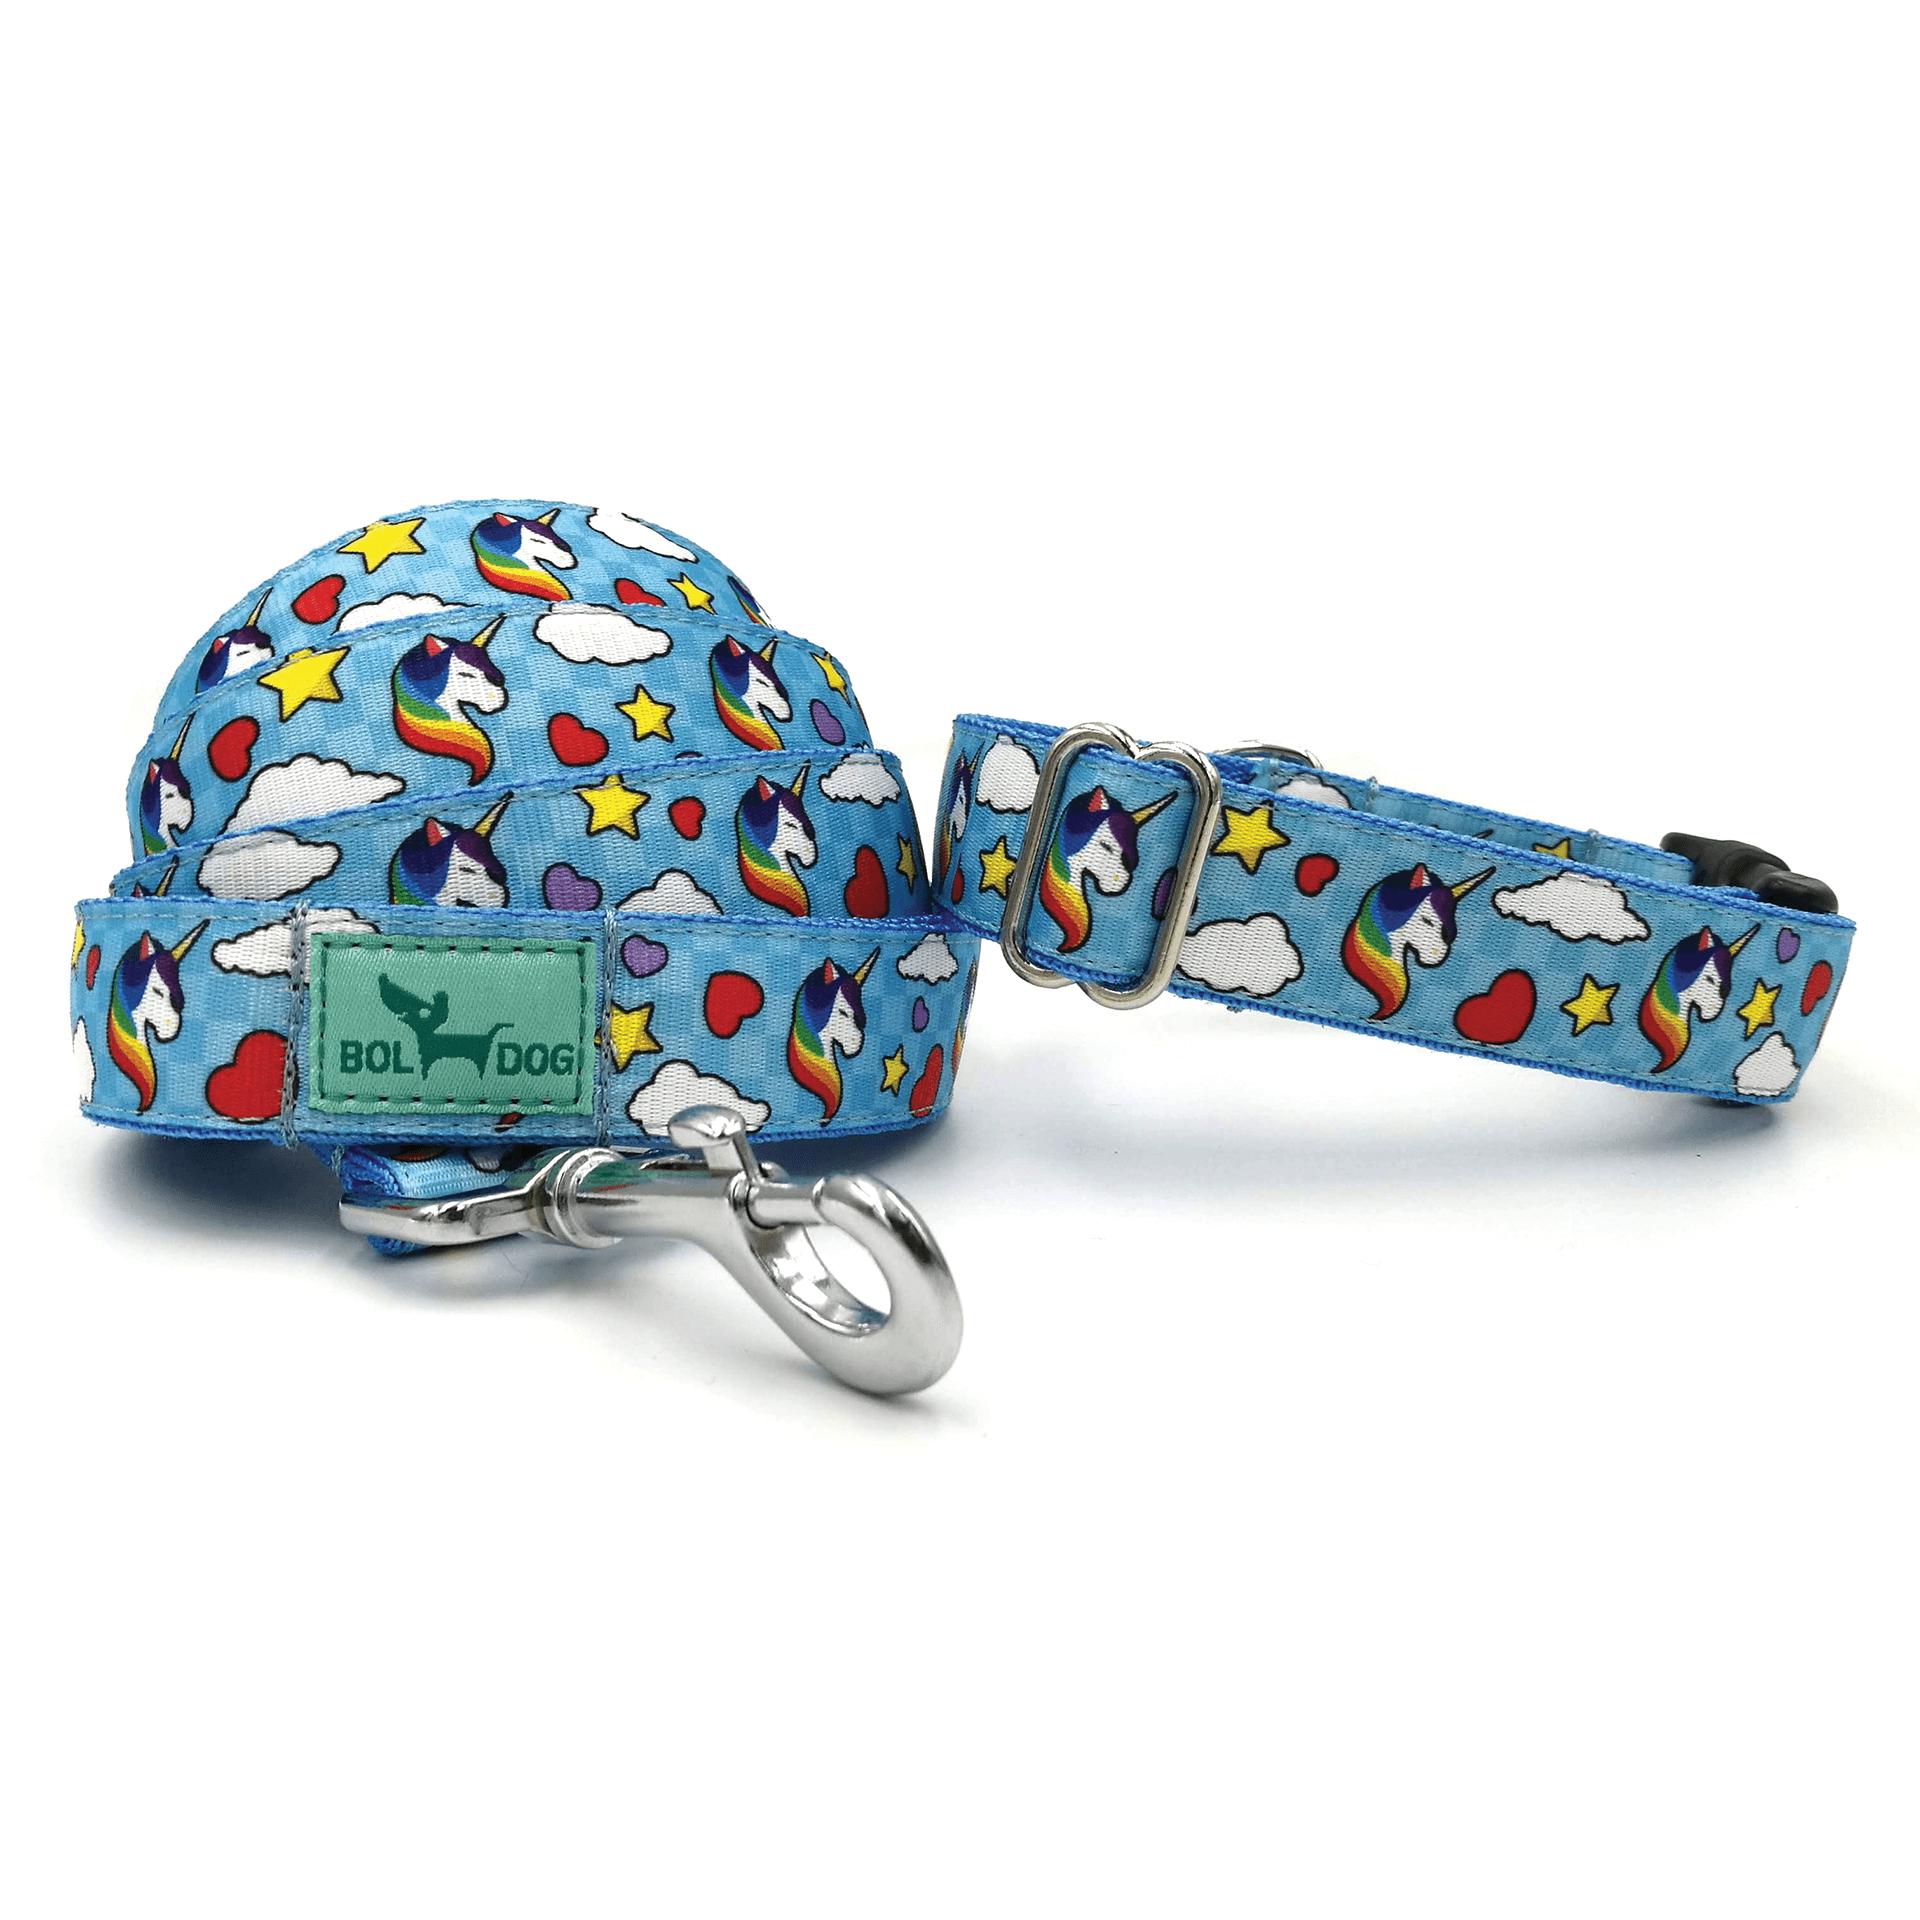 unicorn pattern dog collar and leash